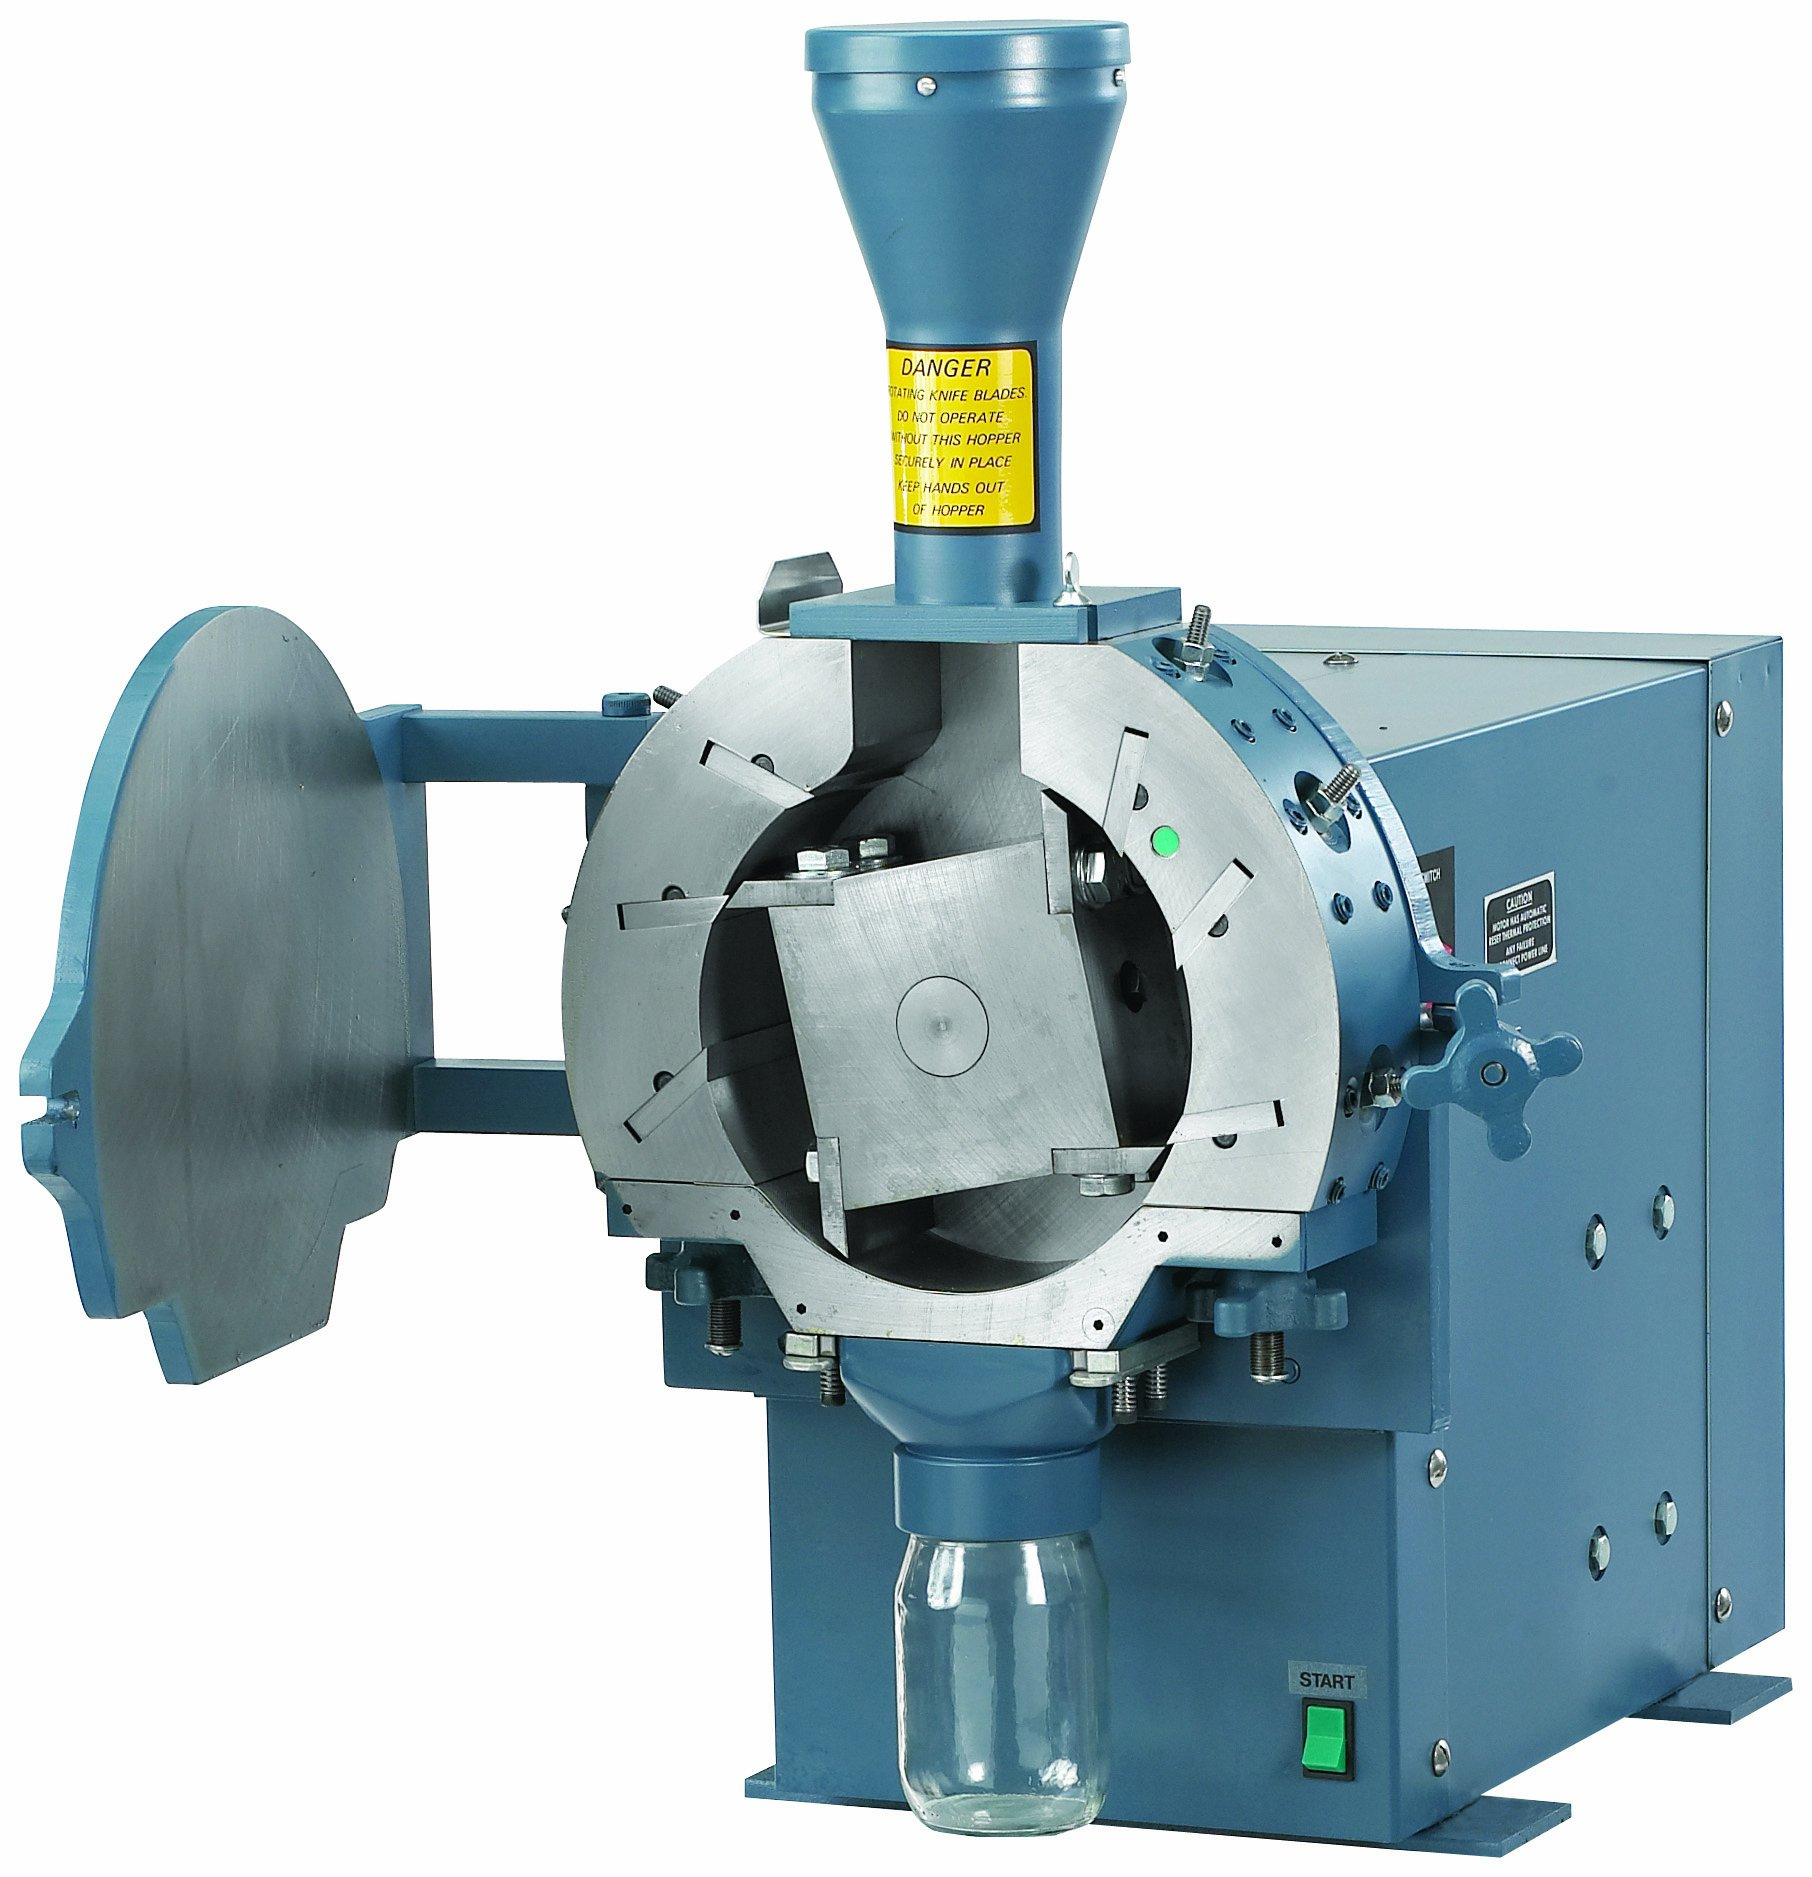 Thomas TP4274E70082 Wiley Mill 4-1/2 Horse Power Unit Door Latch Bolt